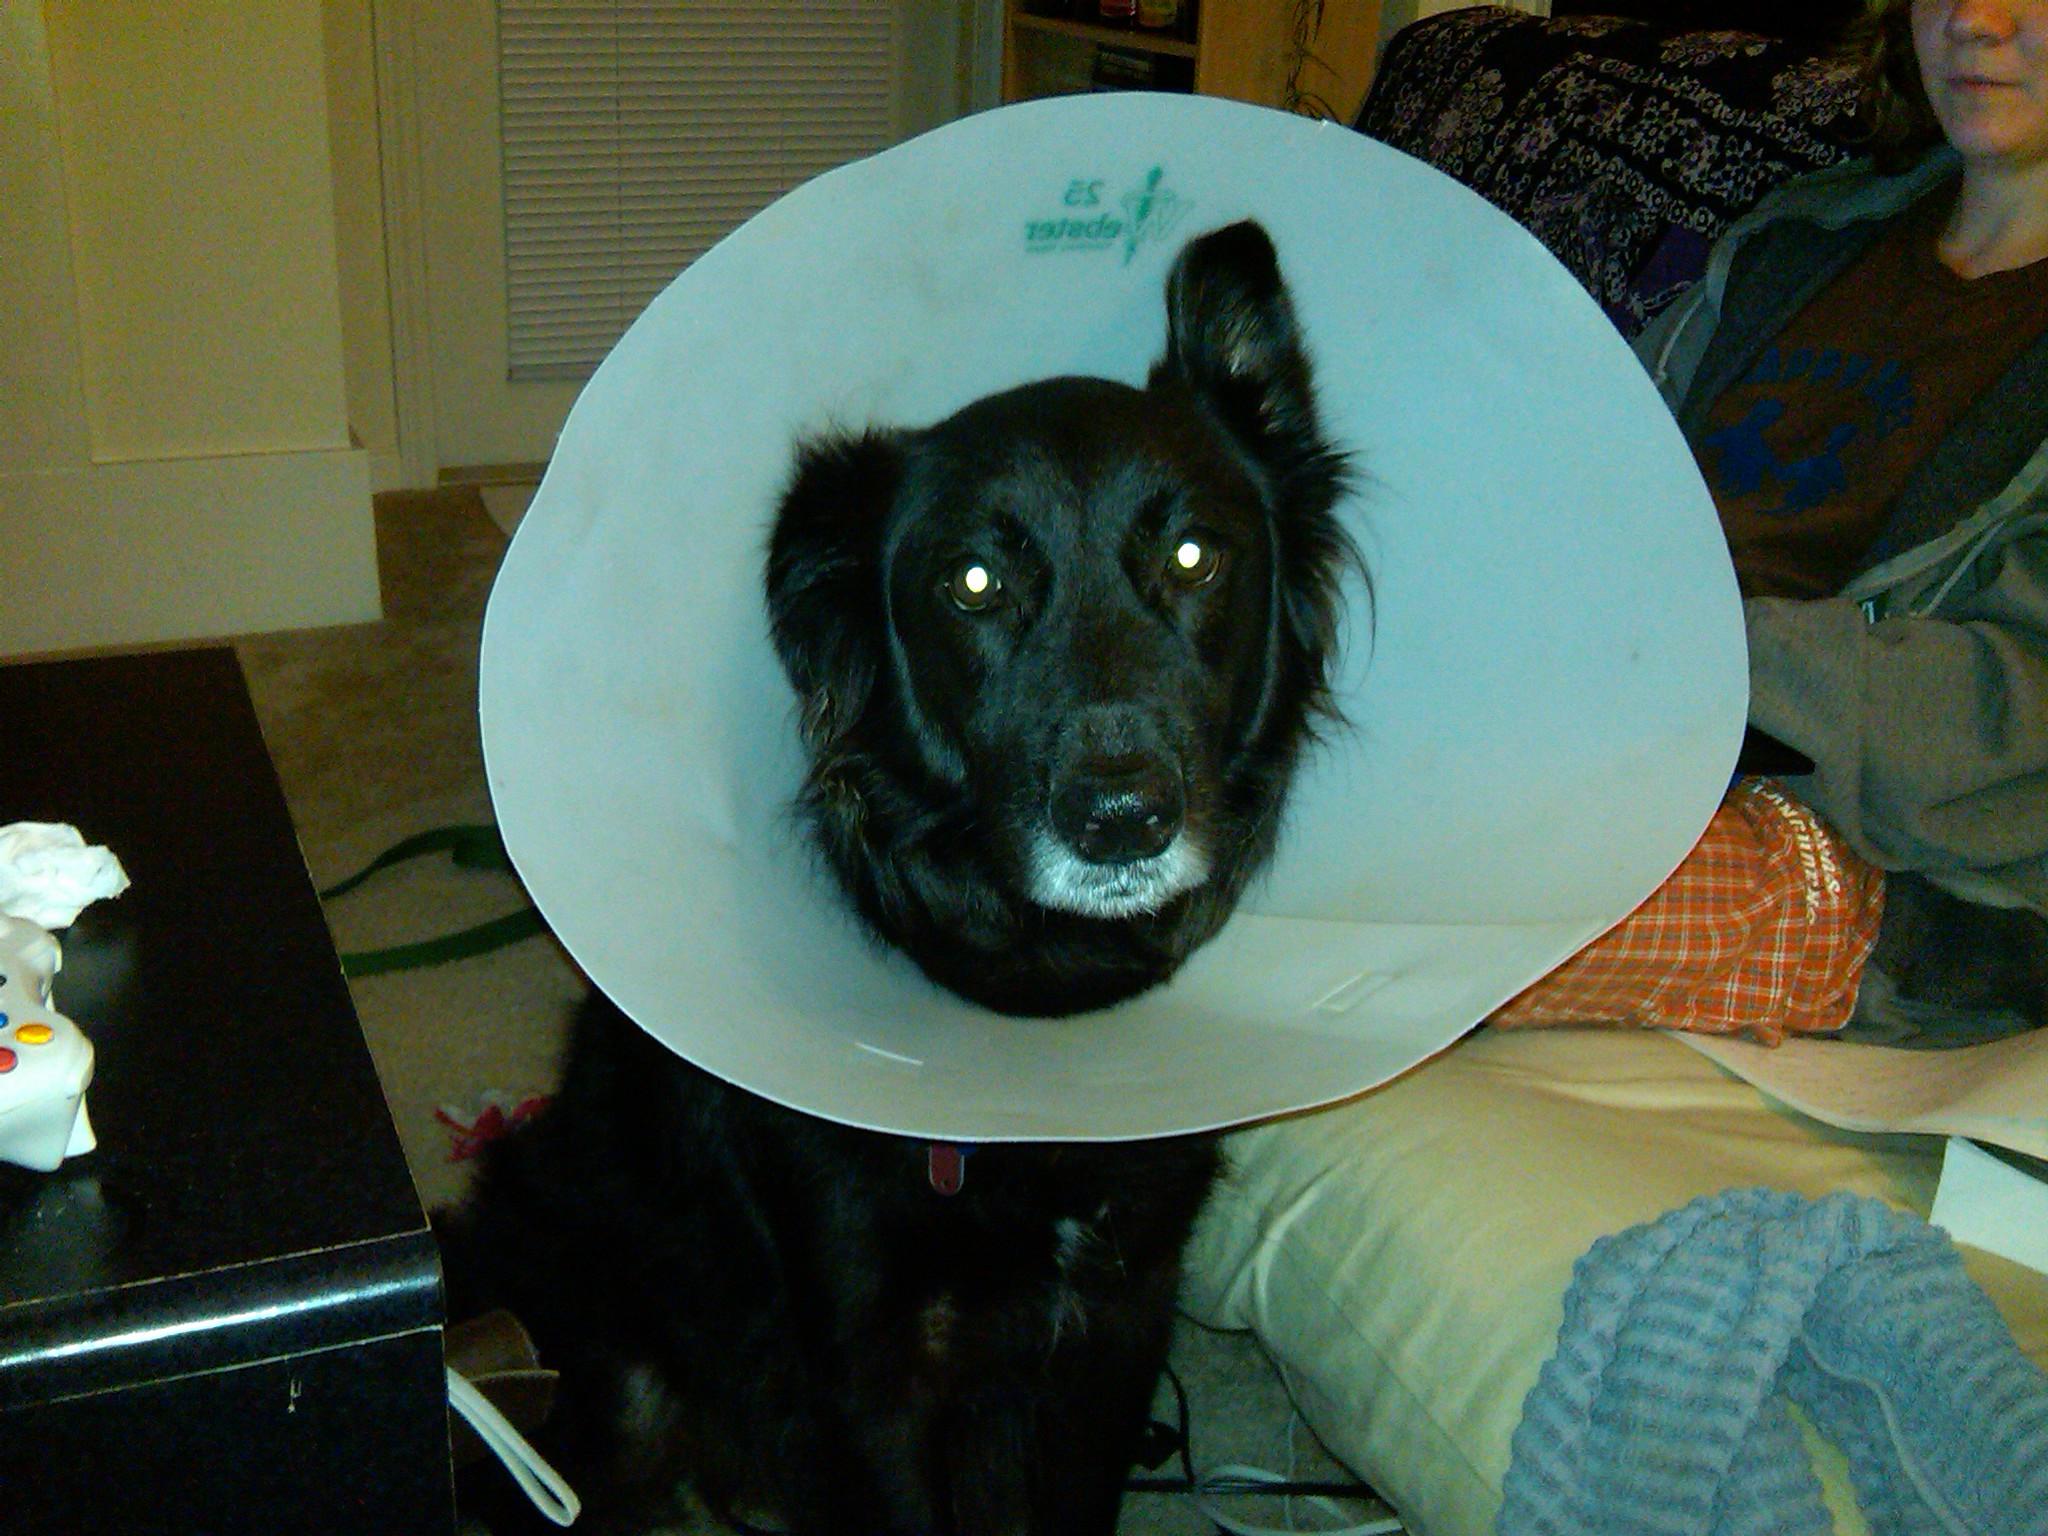 Sad Coneheaded Dog.